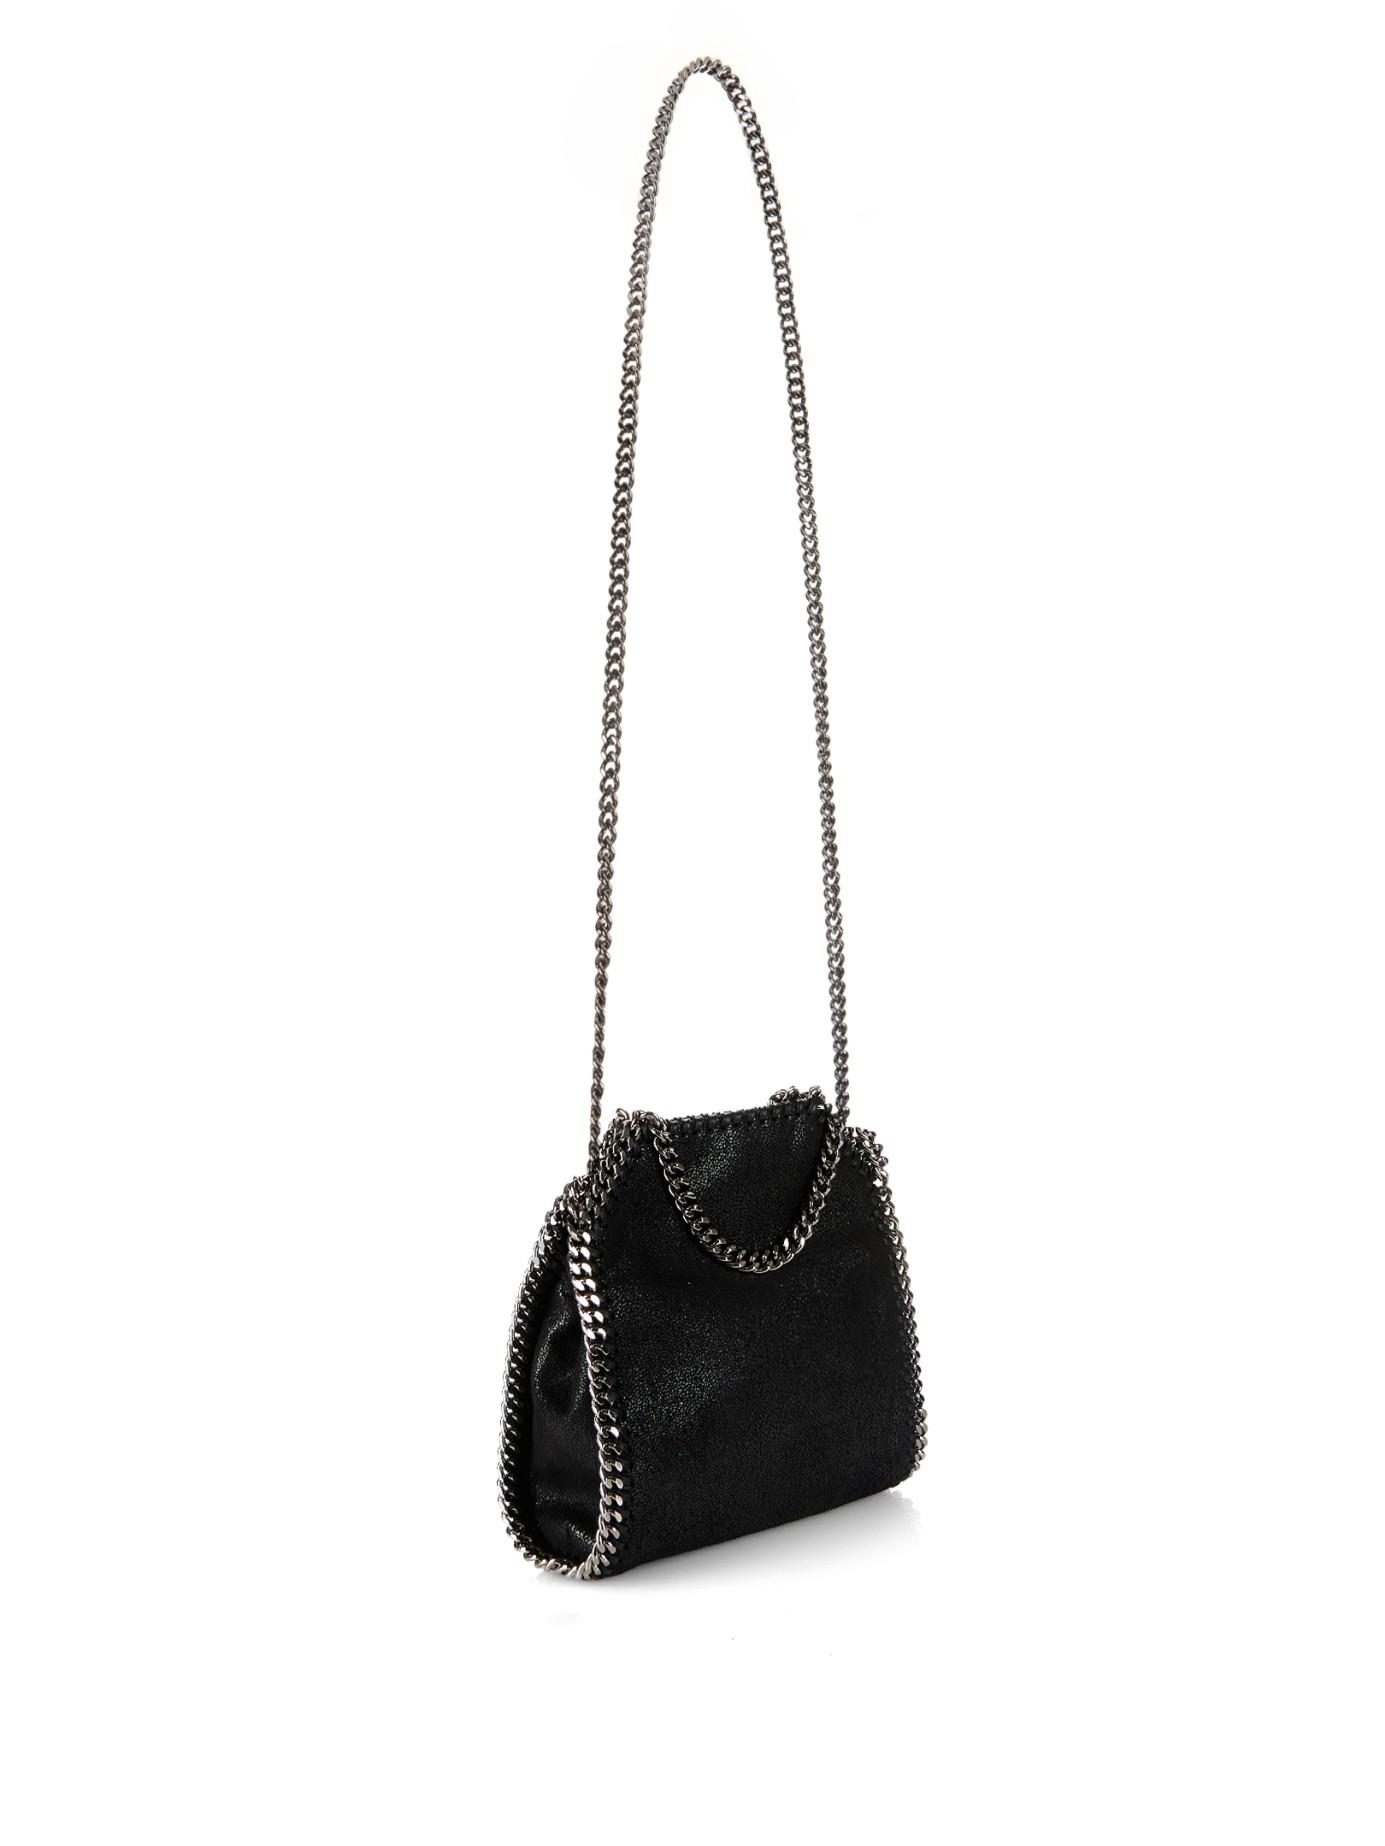 b75b9cac02d Stella McCartney Black Falabella Tiny Faux-Suede Cross-Body Bag